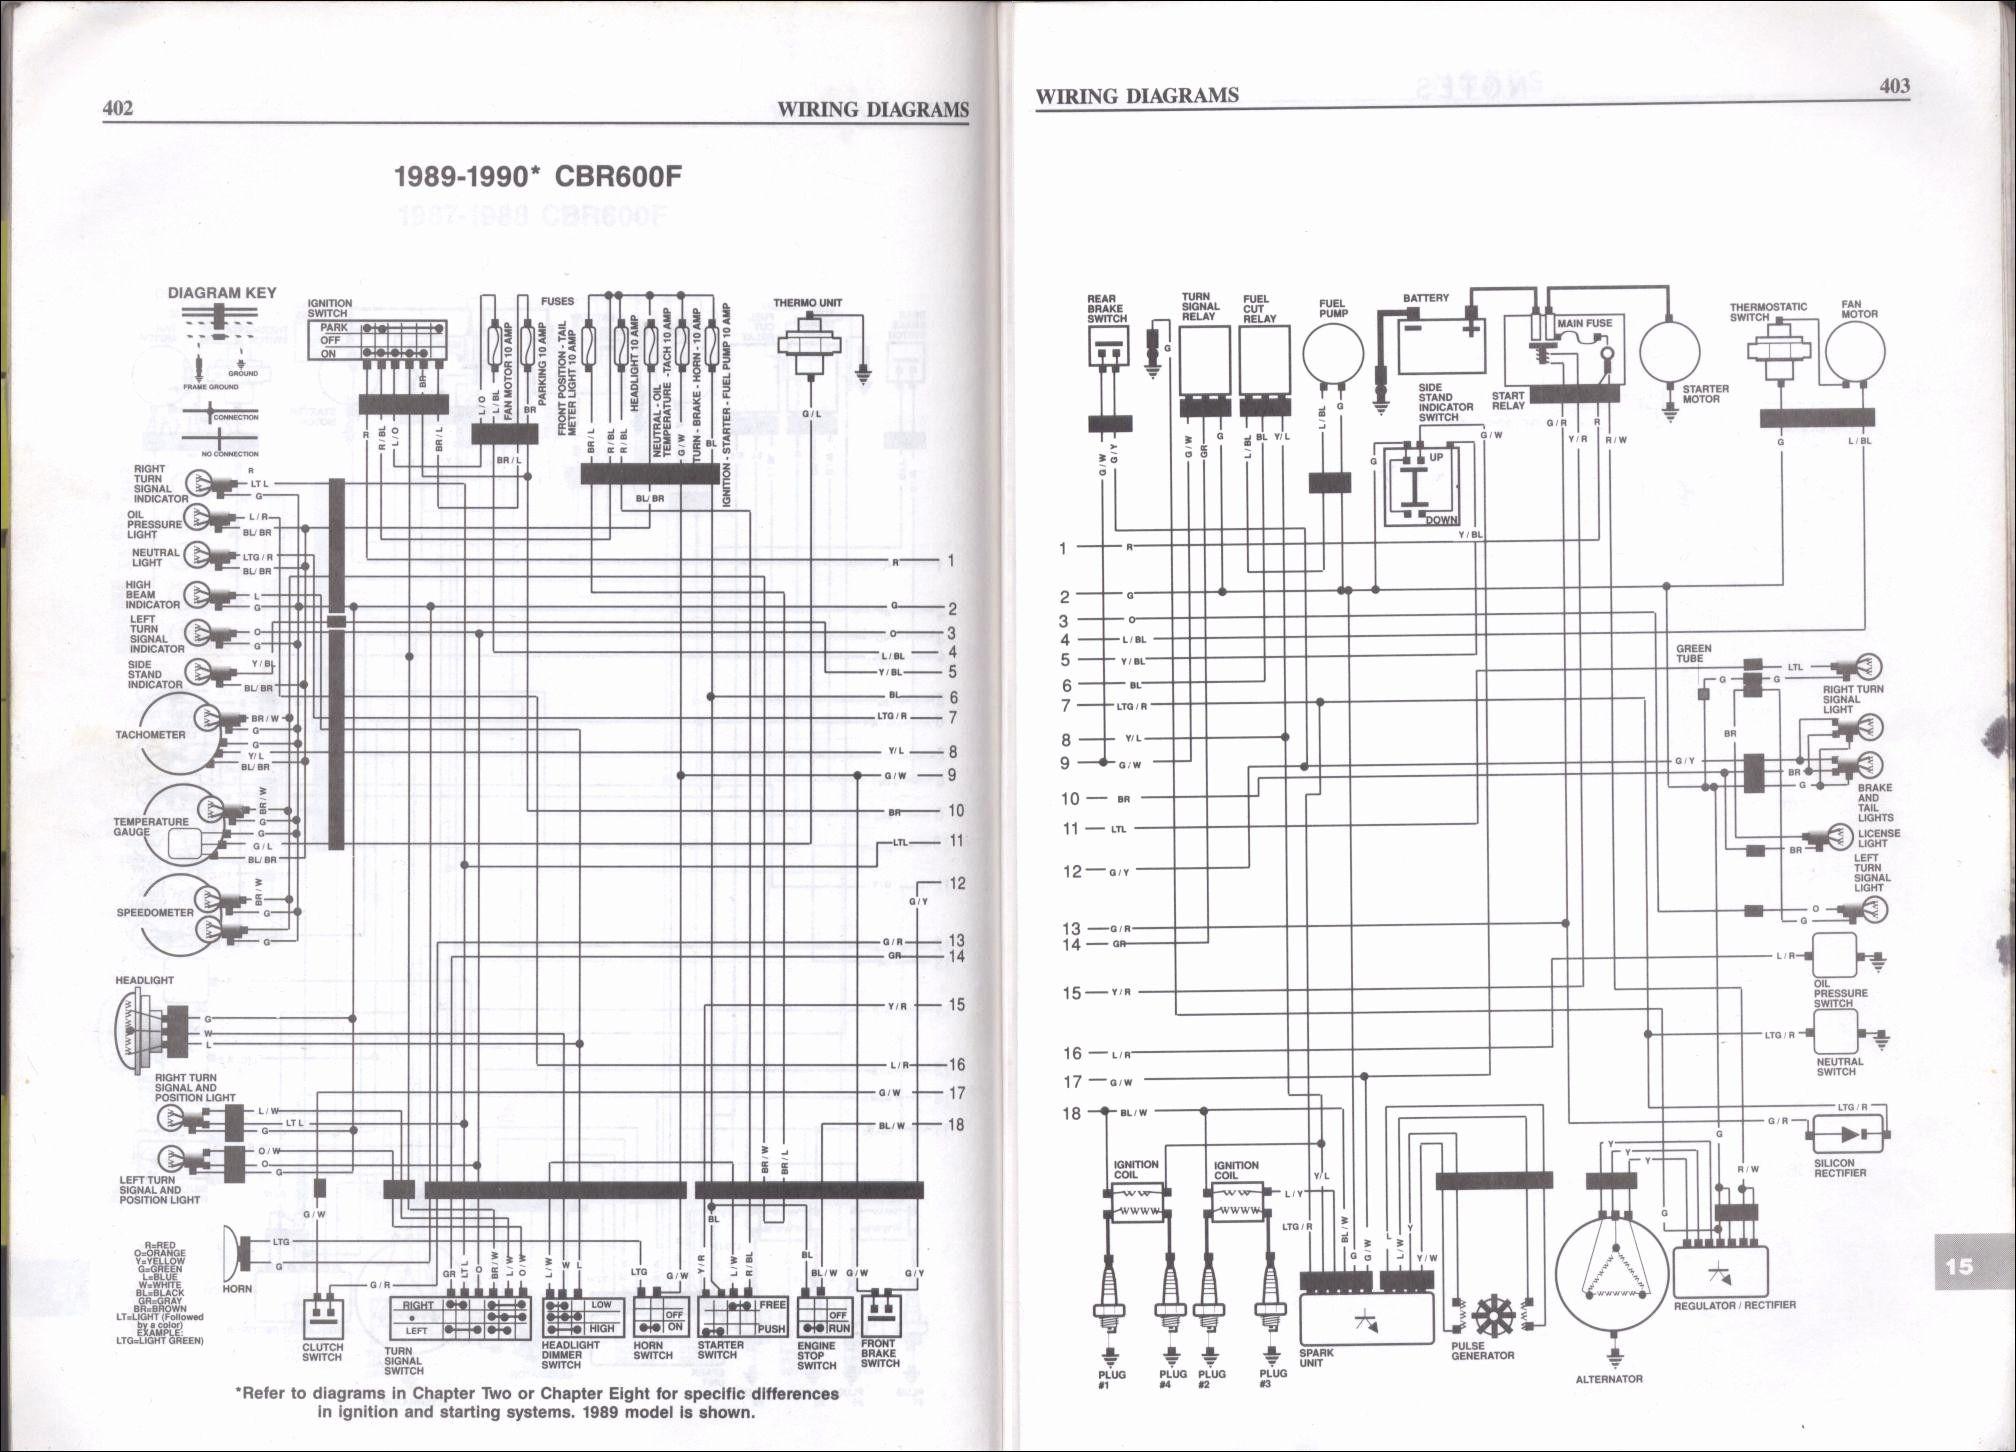 Wirin Diagram Of toyota Corolla 2005 Honda C70 Wiring Diagram Auto Electrical Wiring Diagram Of Wirin Diagram Of toyota Corolla 2005